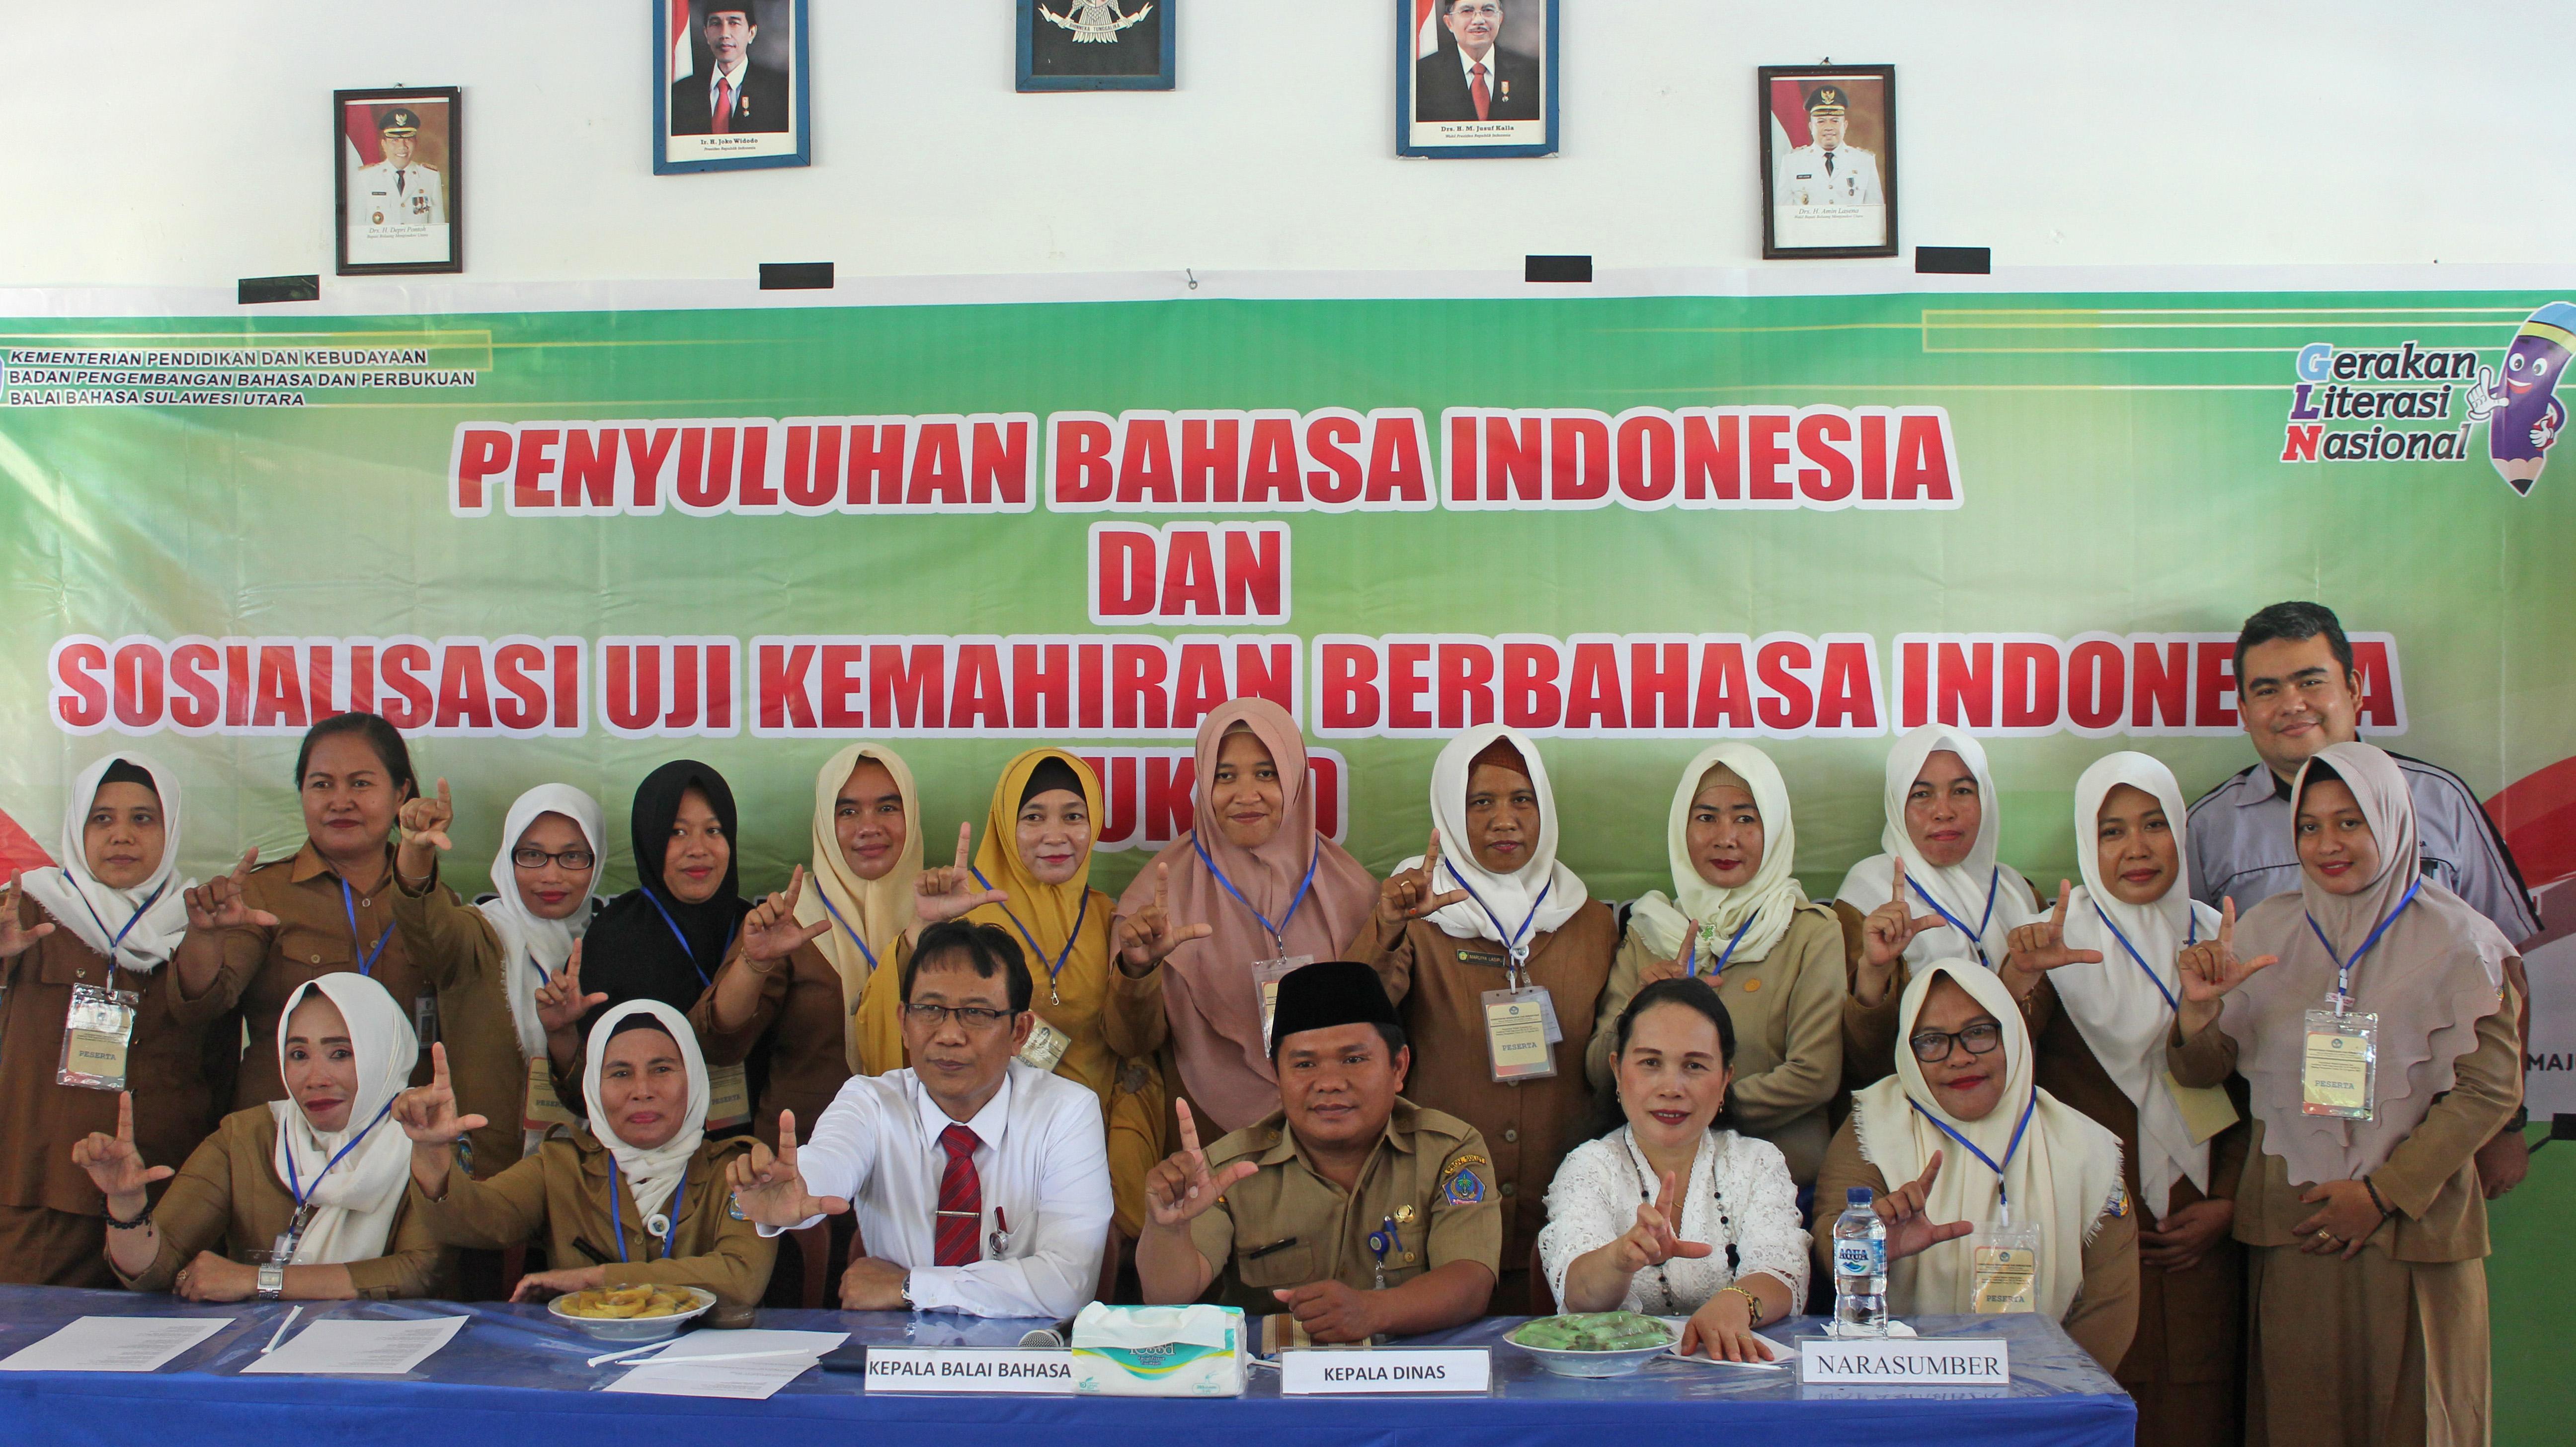 Antusiasme Guru di Penyuluhan Bahasa Indonesia dan Sosialisasi Uji Kemahiran Berbahasa Indonesia Bolaang Mongondow Utara